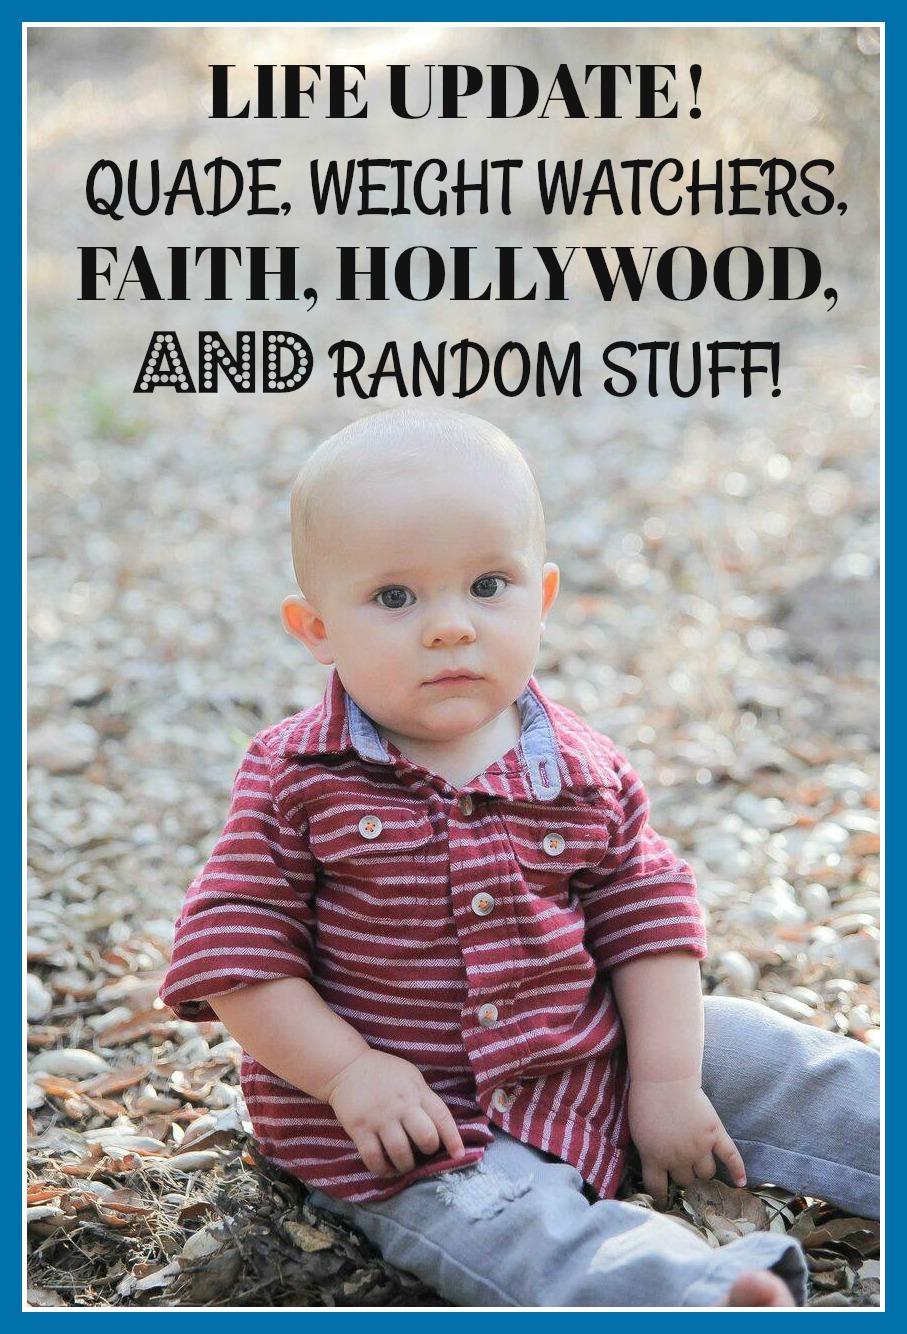 Life Update! Quade, Weight Watchers, Hollywood, Faith, and Random Stuff!.jpg